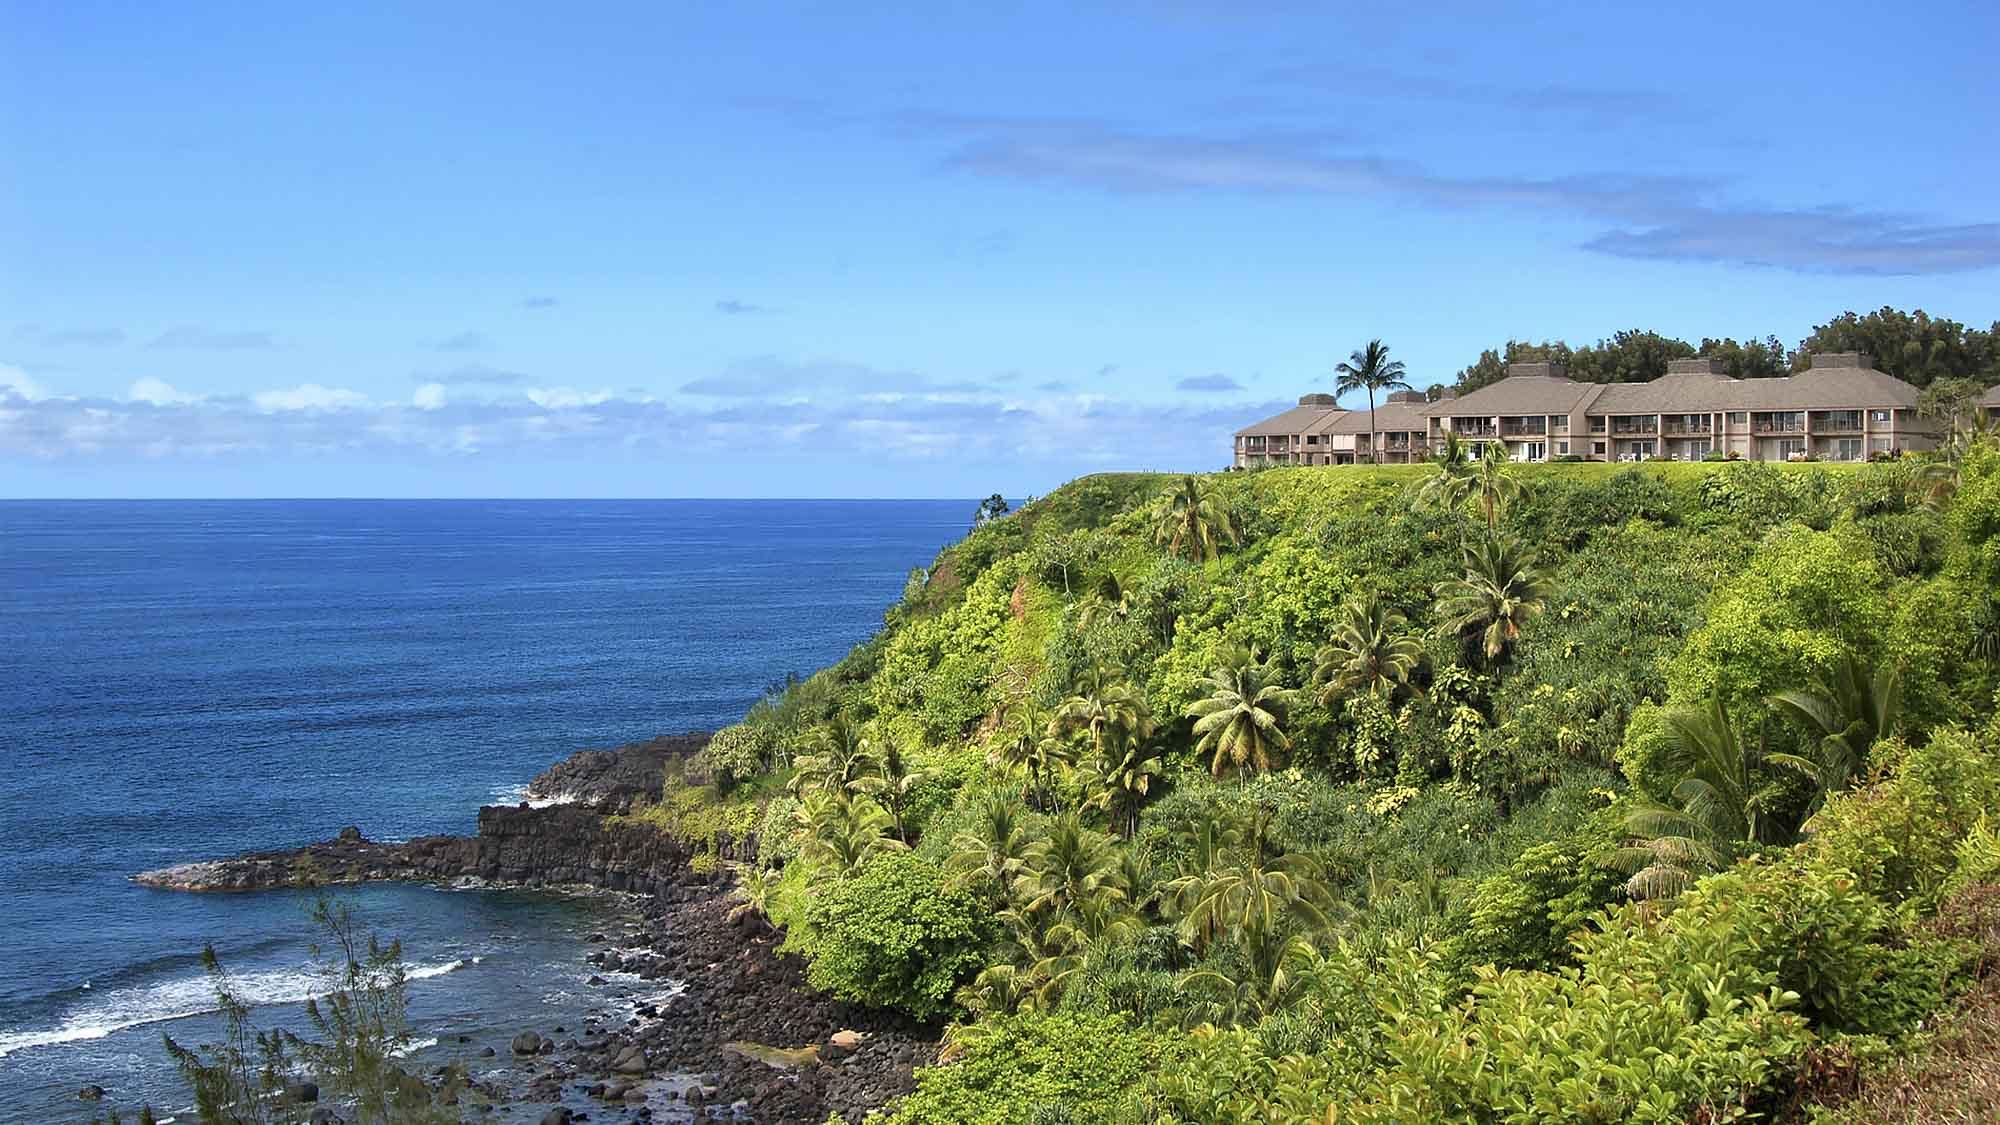 Pali Ke Kua at Princeville 2 - Parrish Kauai